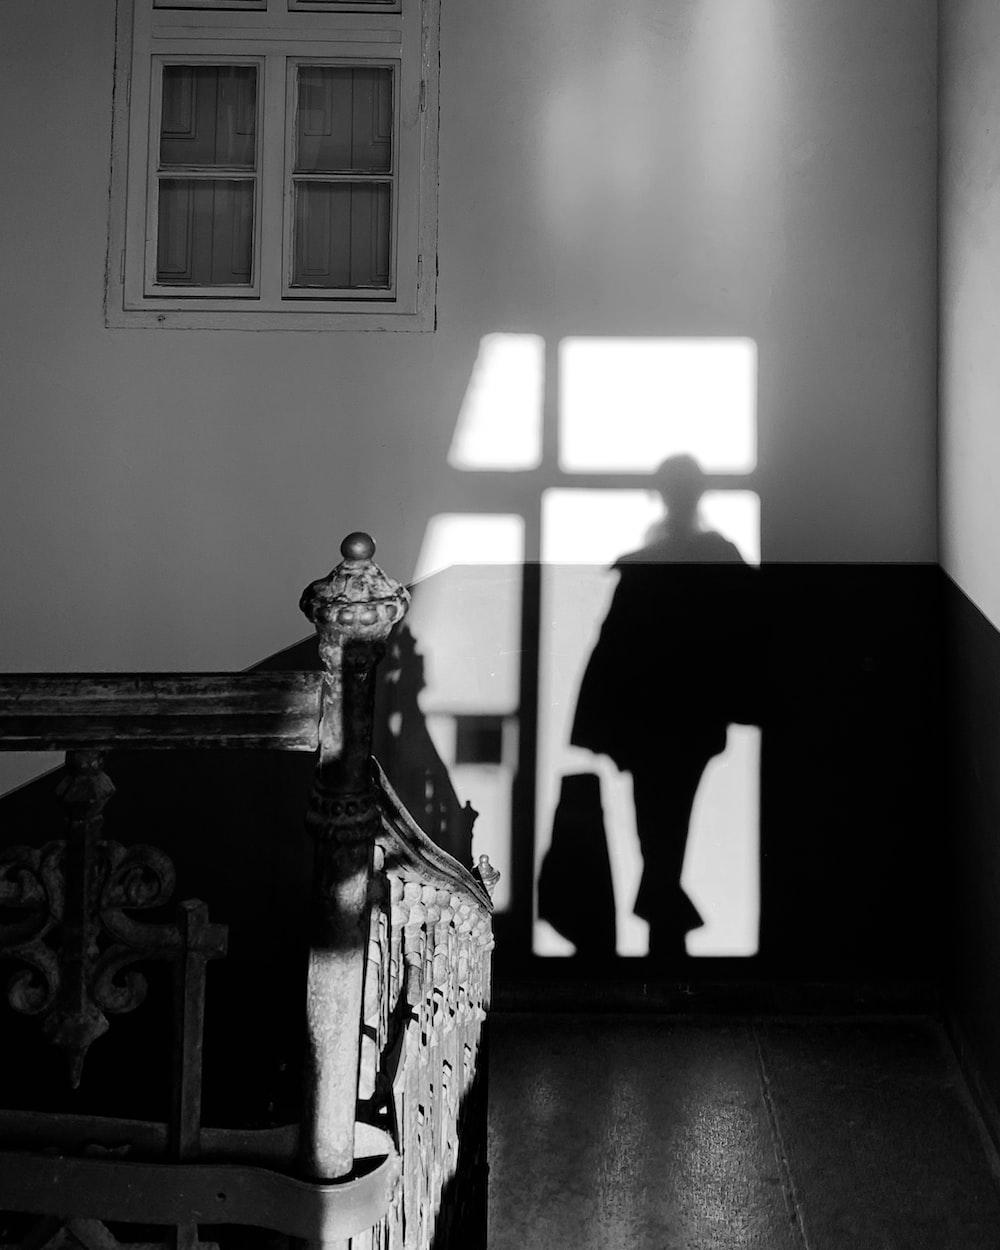 grayscale photo of woman in dress standing near window